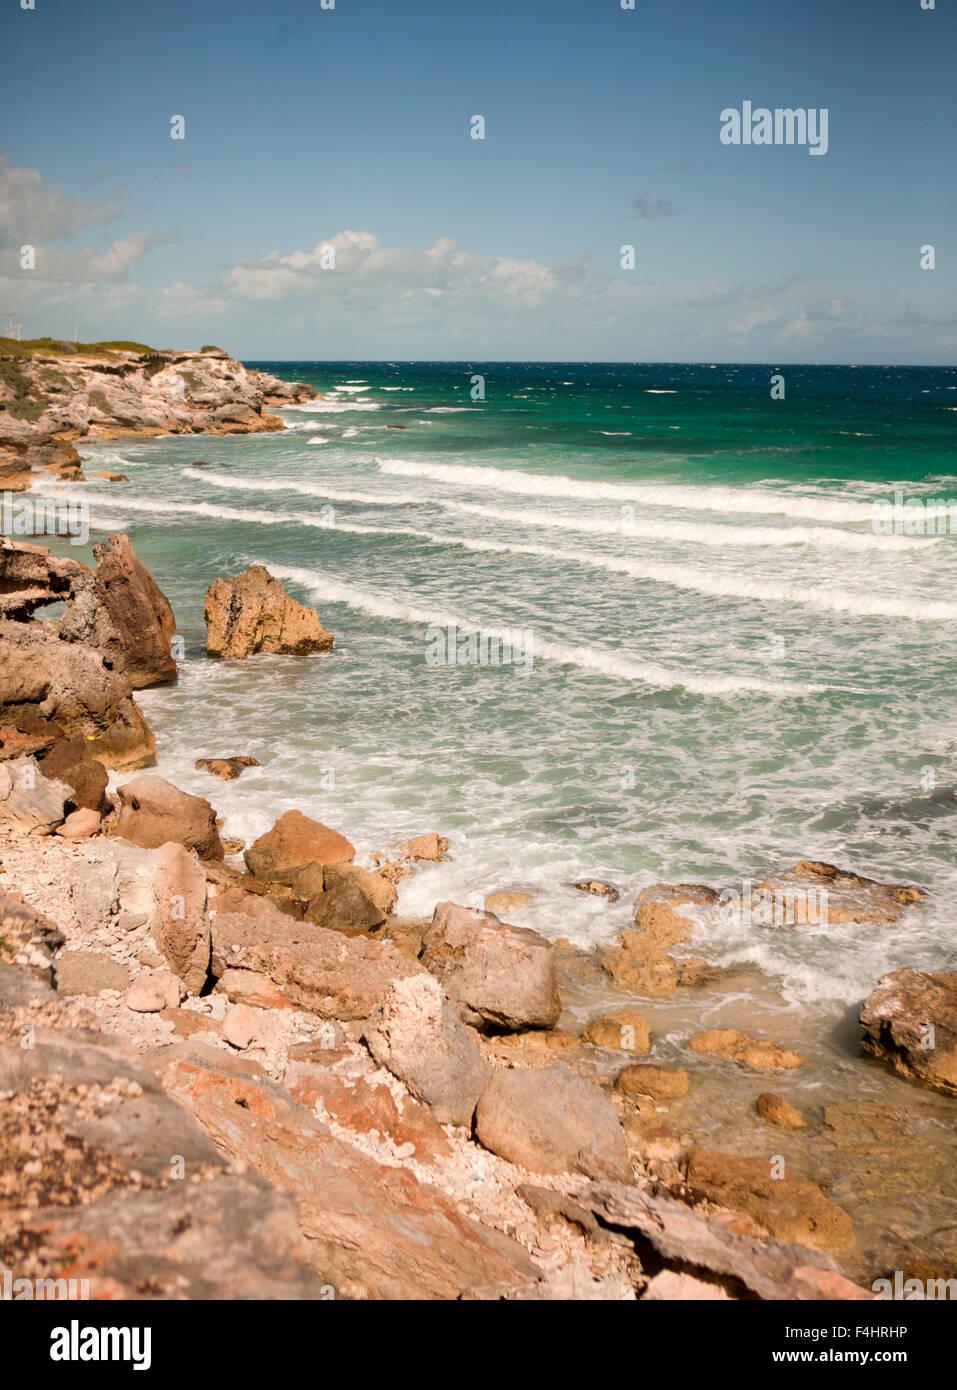 Blick auf die Karibik-Küste entlang was Touristen, Panorama-Fahrt, Isla Mujeres, Quintana Roo, Mexiko nennen. Stockbild